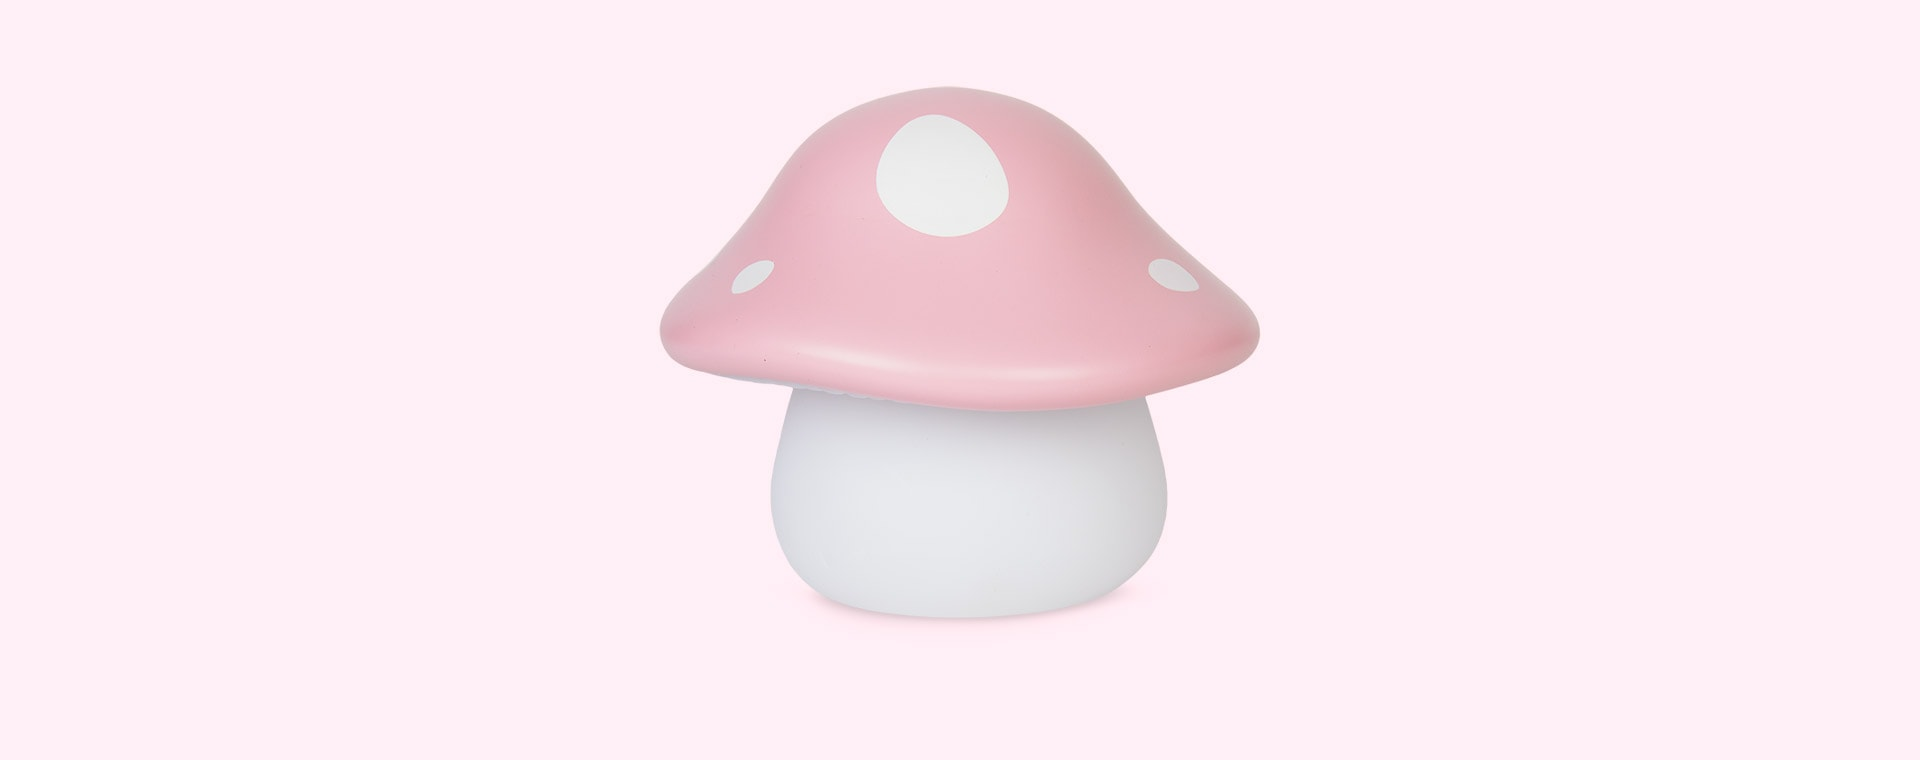 Pink A Little Lovely Company Mushroom Little Light